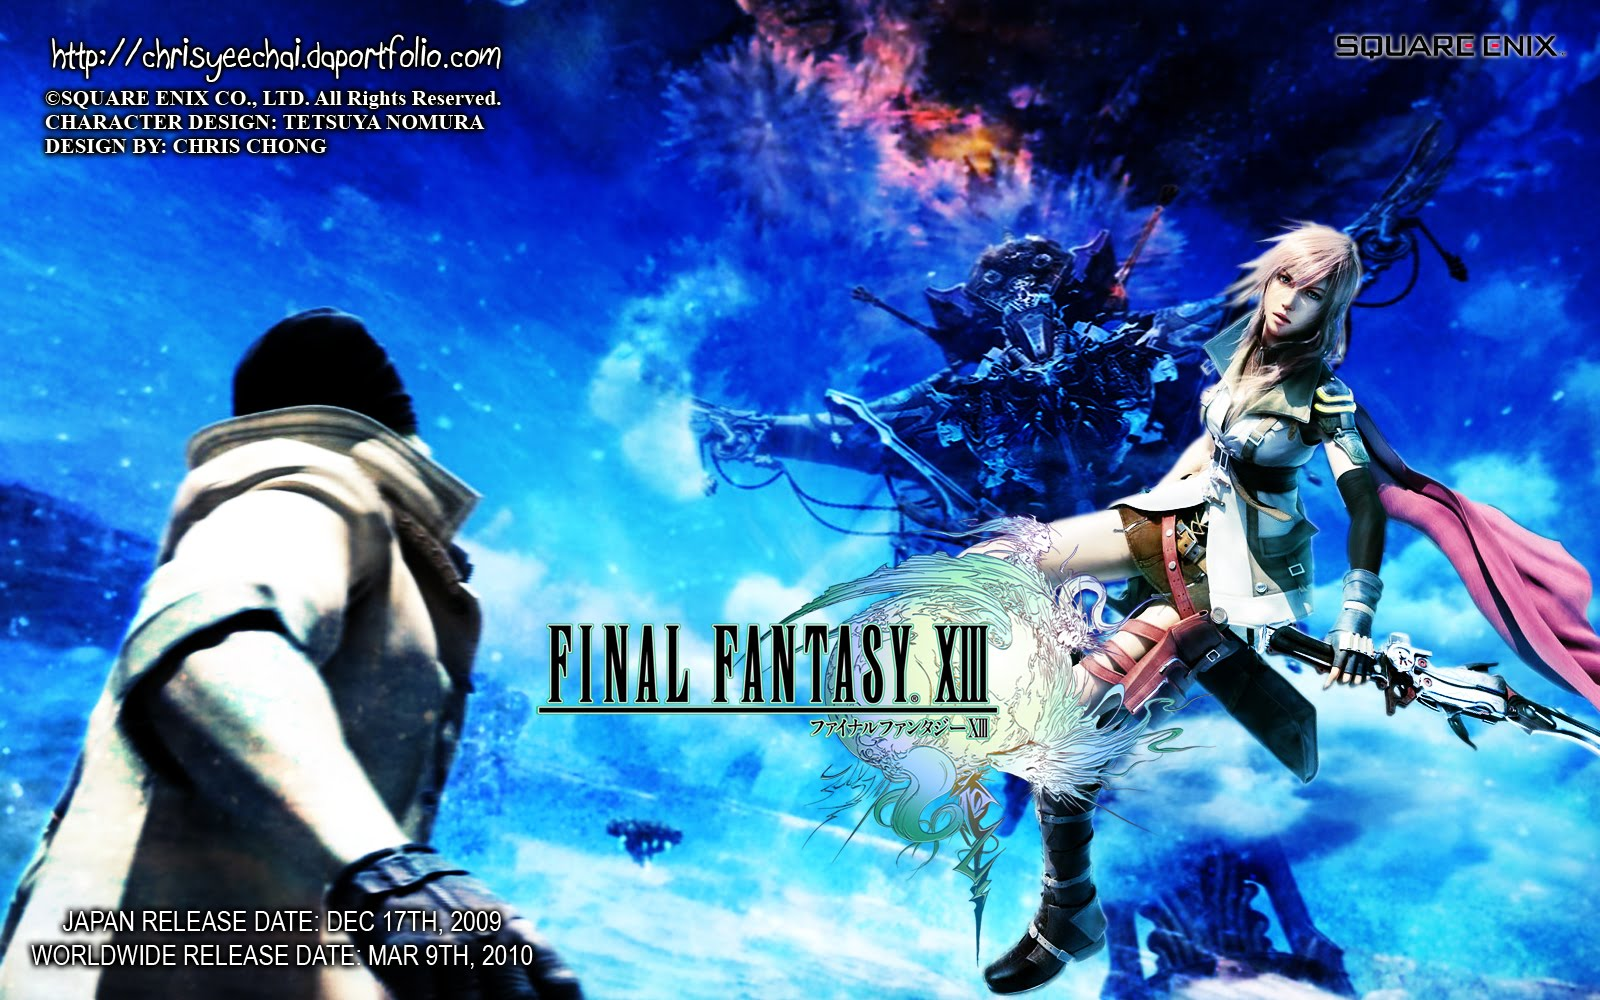 http://4.bp.blogspot.com/_chYijs2N6SA/S9l1CzMJP1I/AAAAAAAAAgw/m9sIvJ0hcf8/s1600/Final_Fantasy_13_wallpaper_12_by_chrisyeechai.jpg